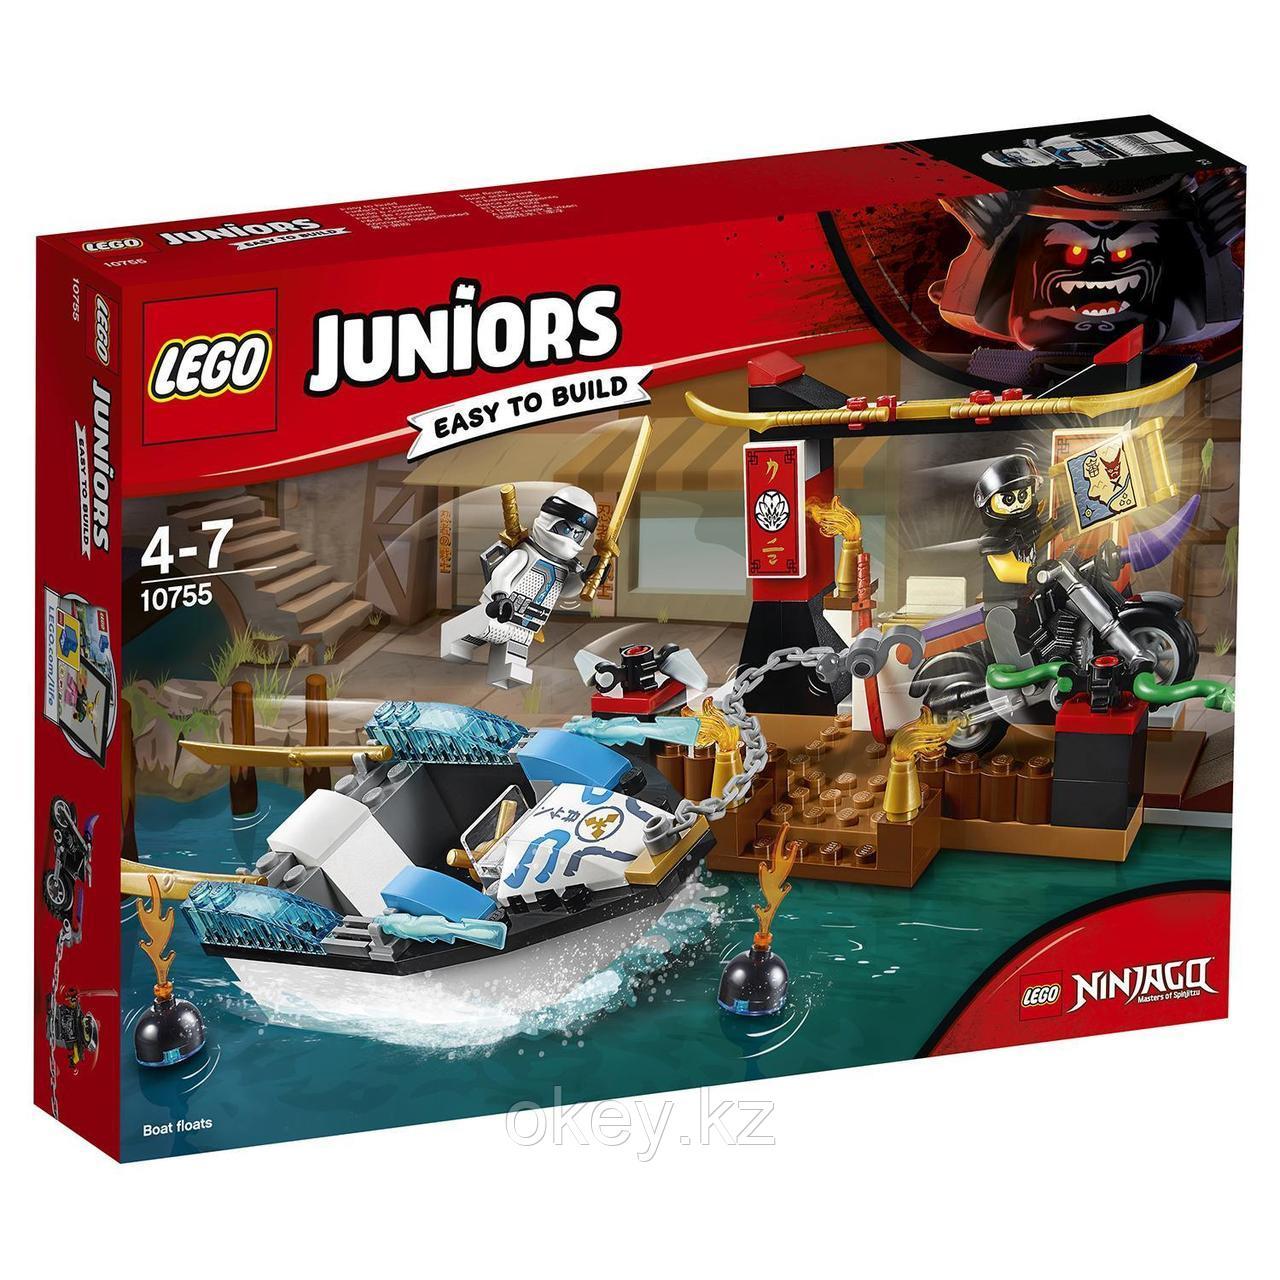 LEGO Juniors: Погоня на моторной лодке Зейна 10755